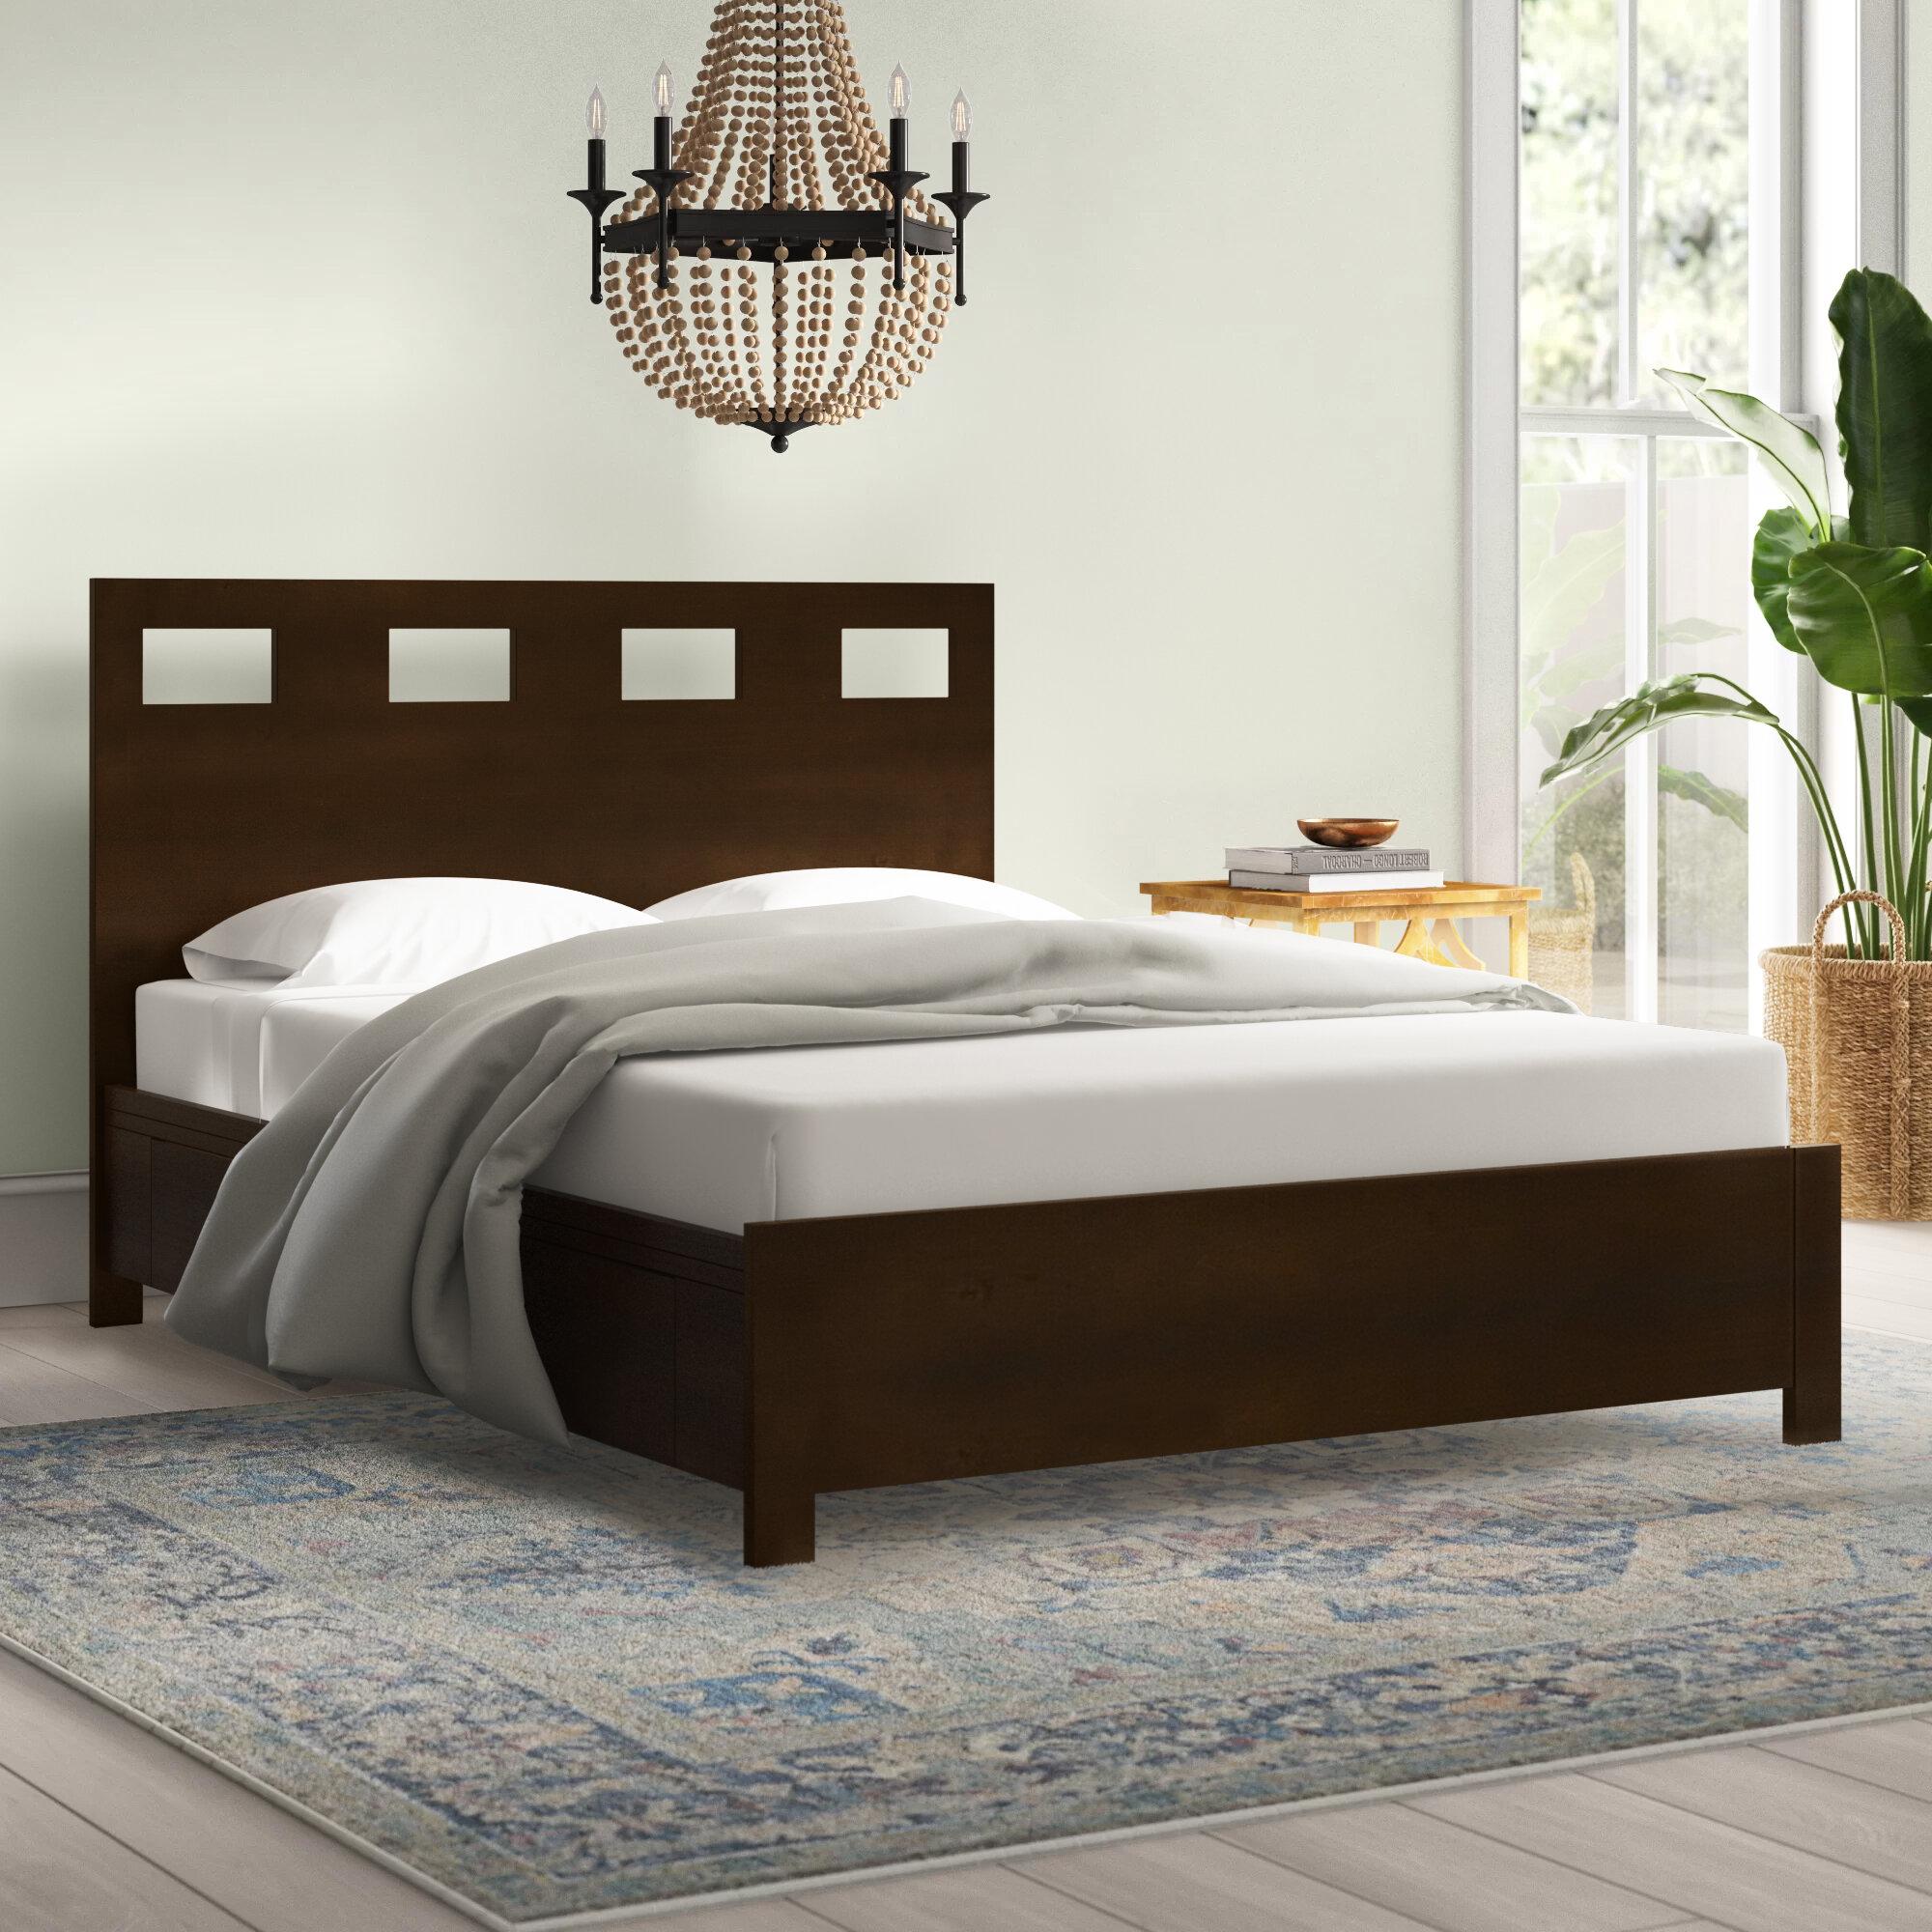 Bohemian Wood Beds You Ll Love In 2021 Wayfair